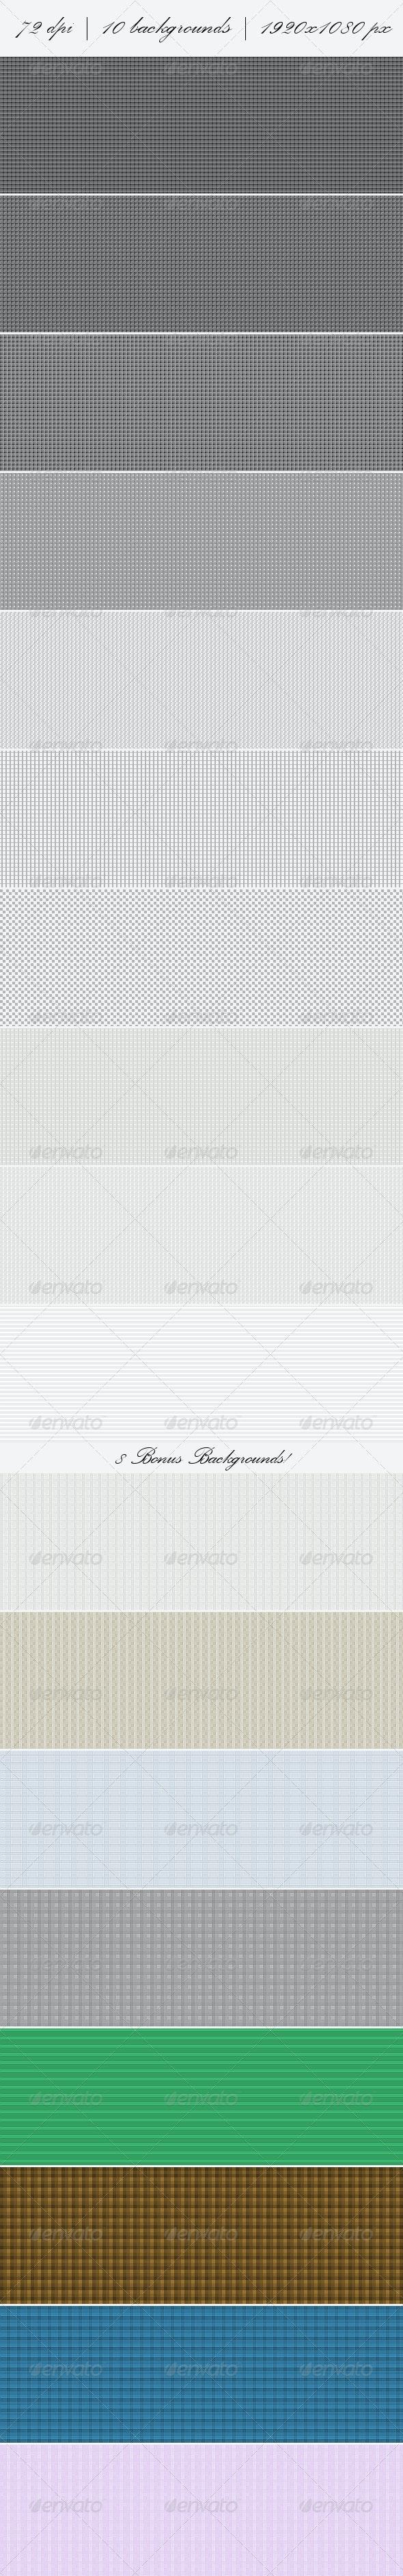 Minimal Pixel Web Backgrounds + Bonus Backgrounds - Miscellaneous Backgrounds